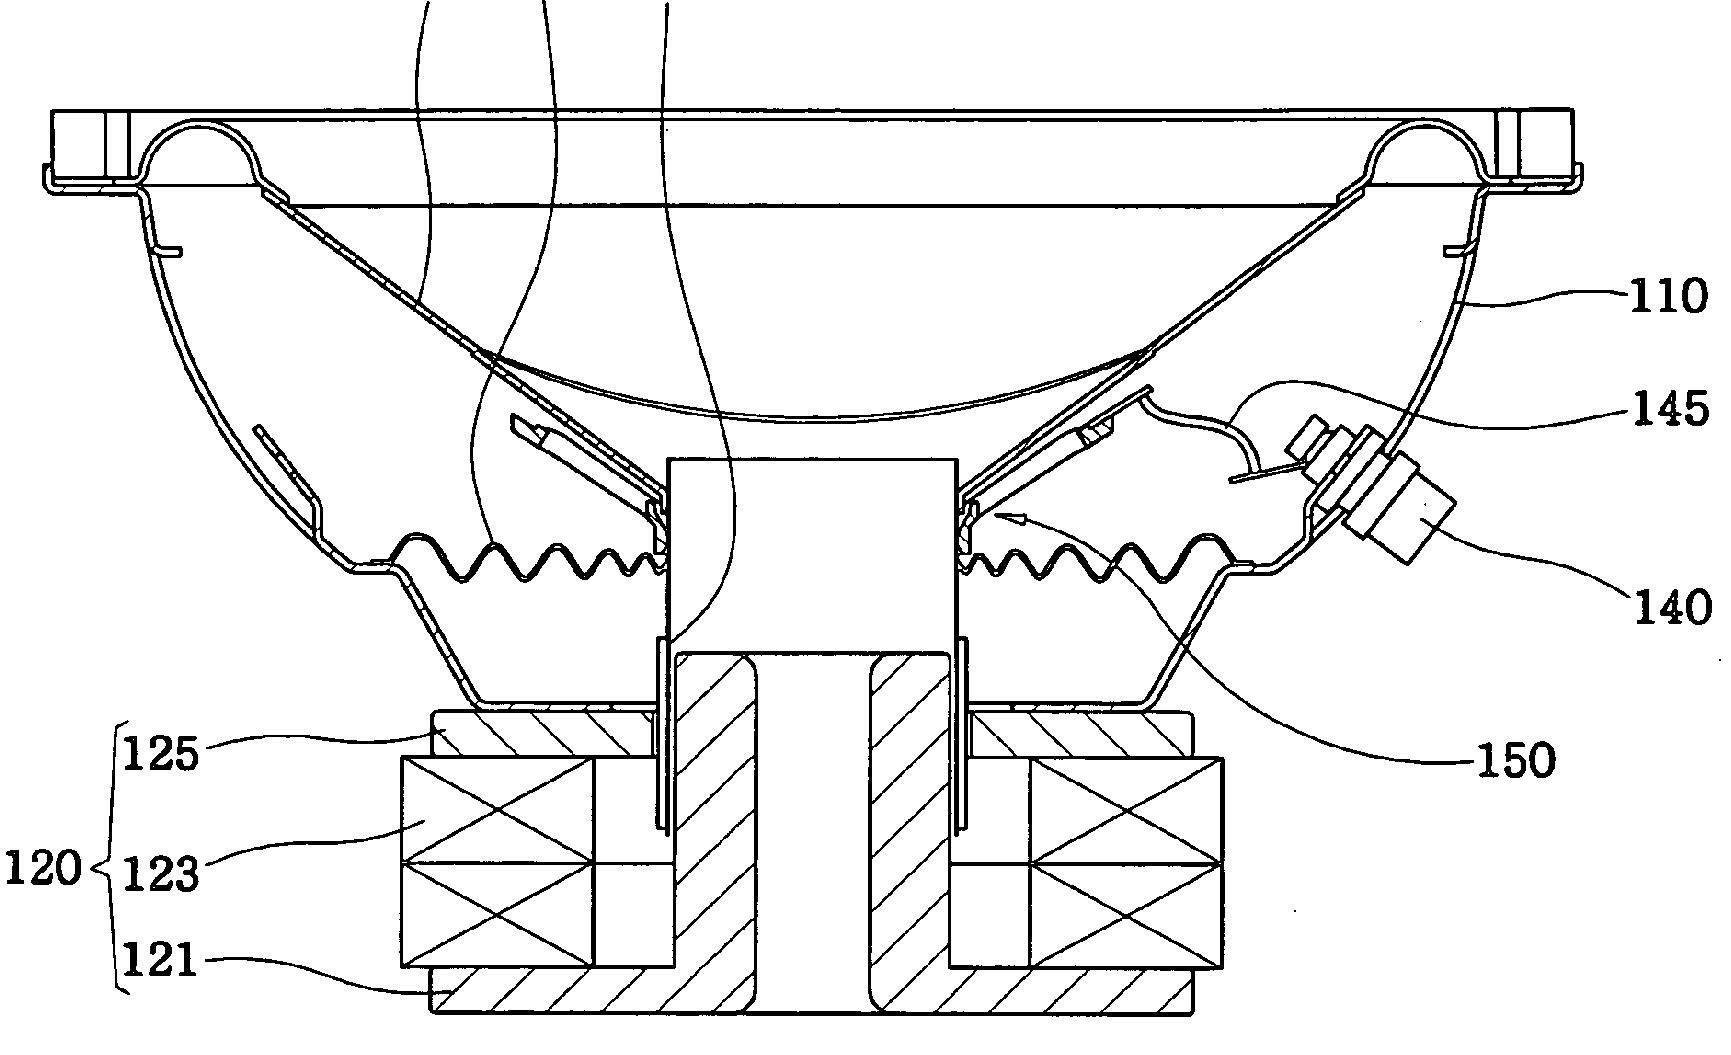 Farmall H Tractor Wiring Diagram 6v System Light Tower